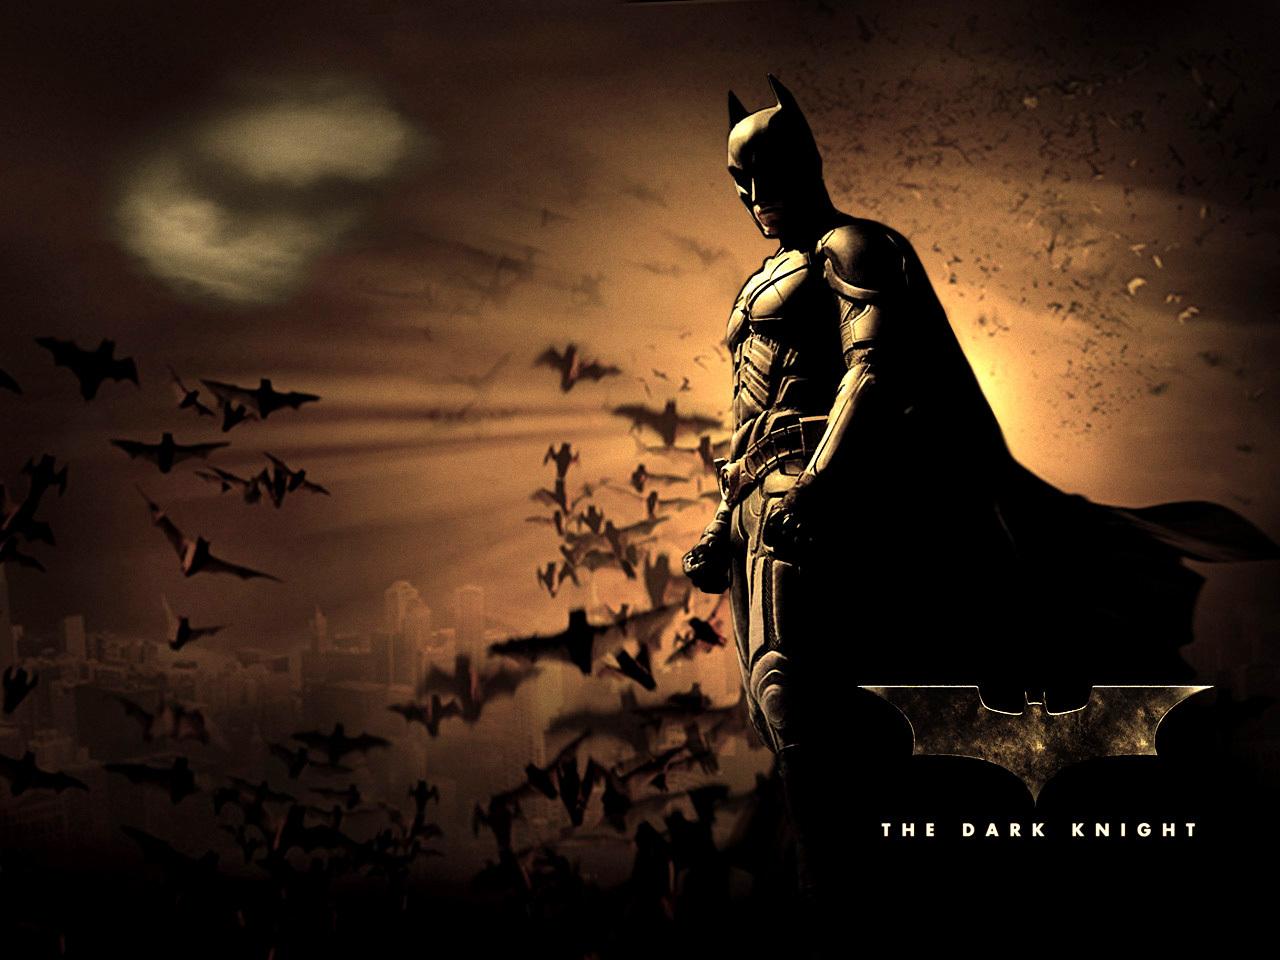 Batman batman and robin 9932912 1280 960jpg 1280x960